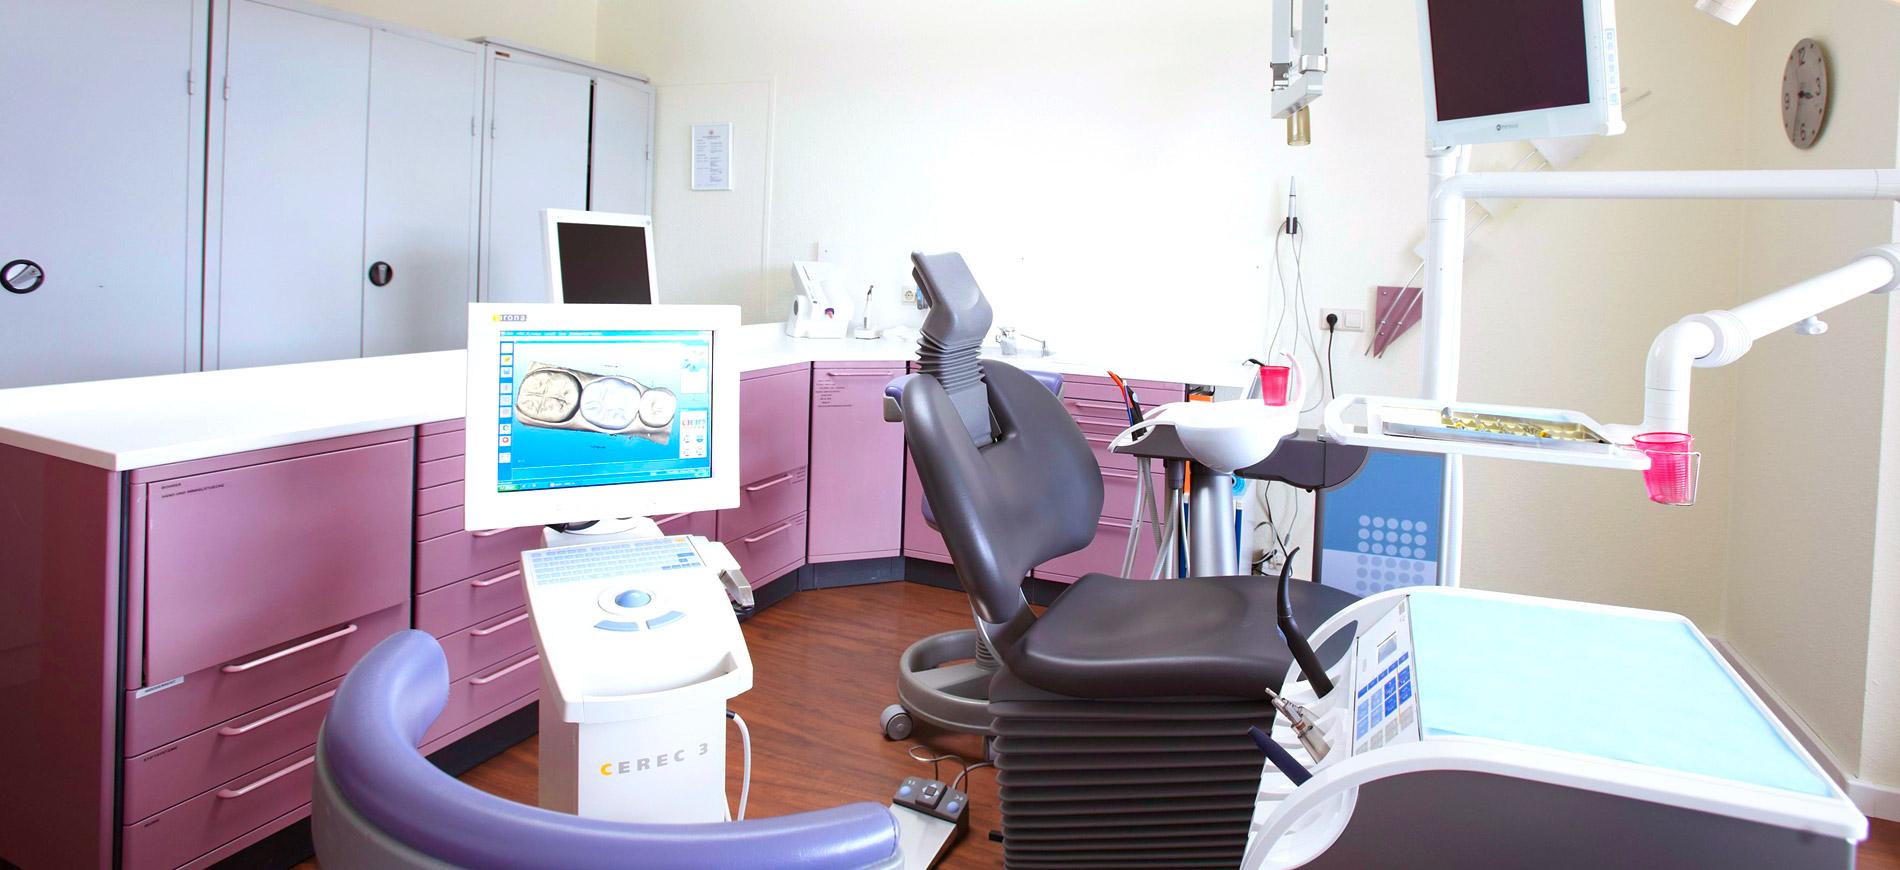 Zahnarzt Dr. Marco Eck - Impressum 1